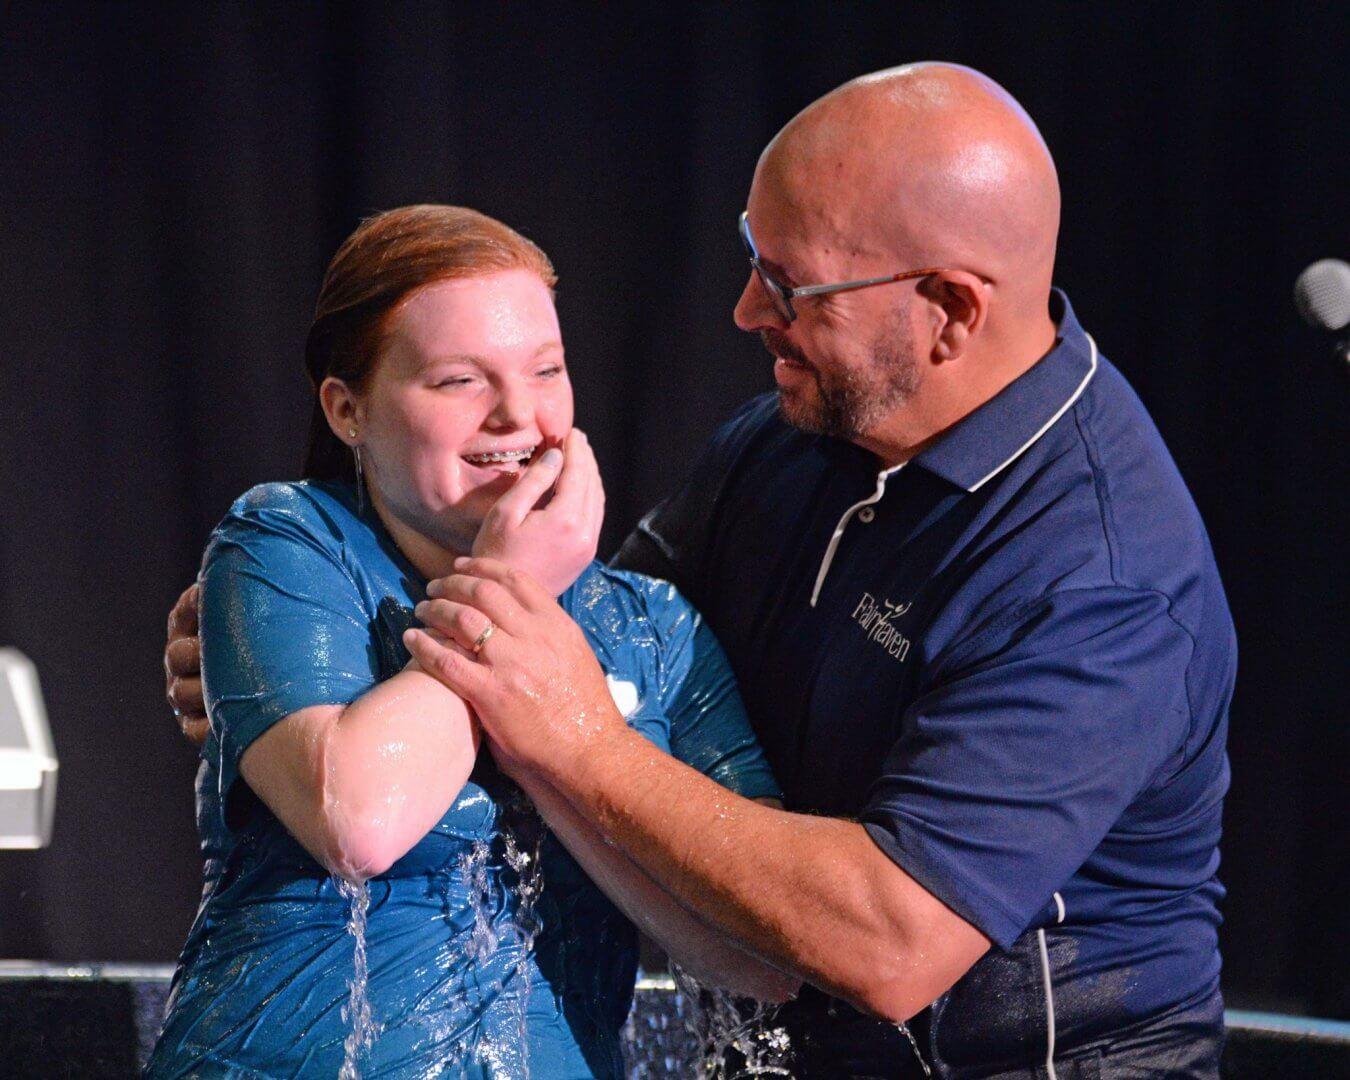 Baptism: An outward sign of an inward change